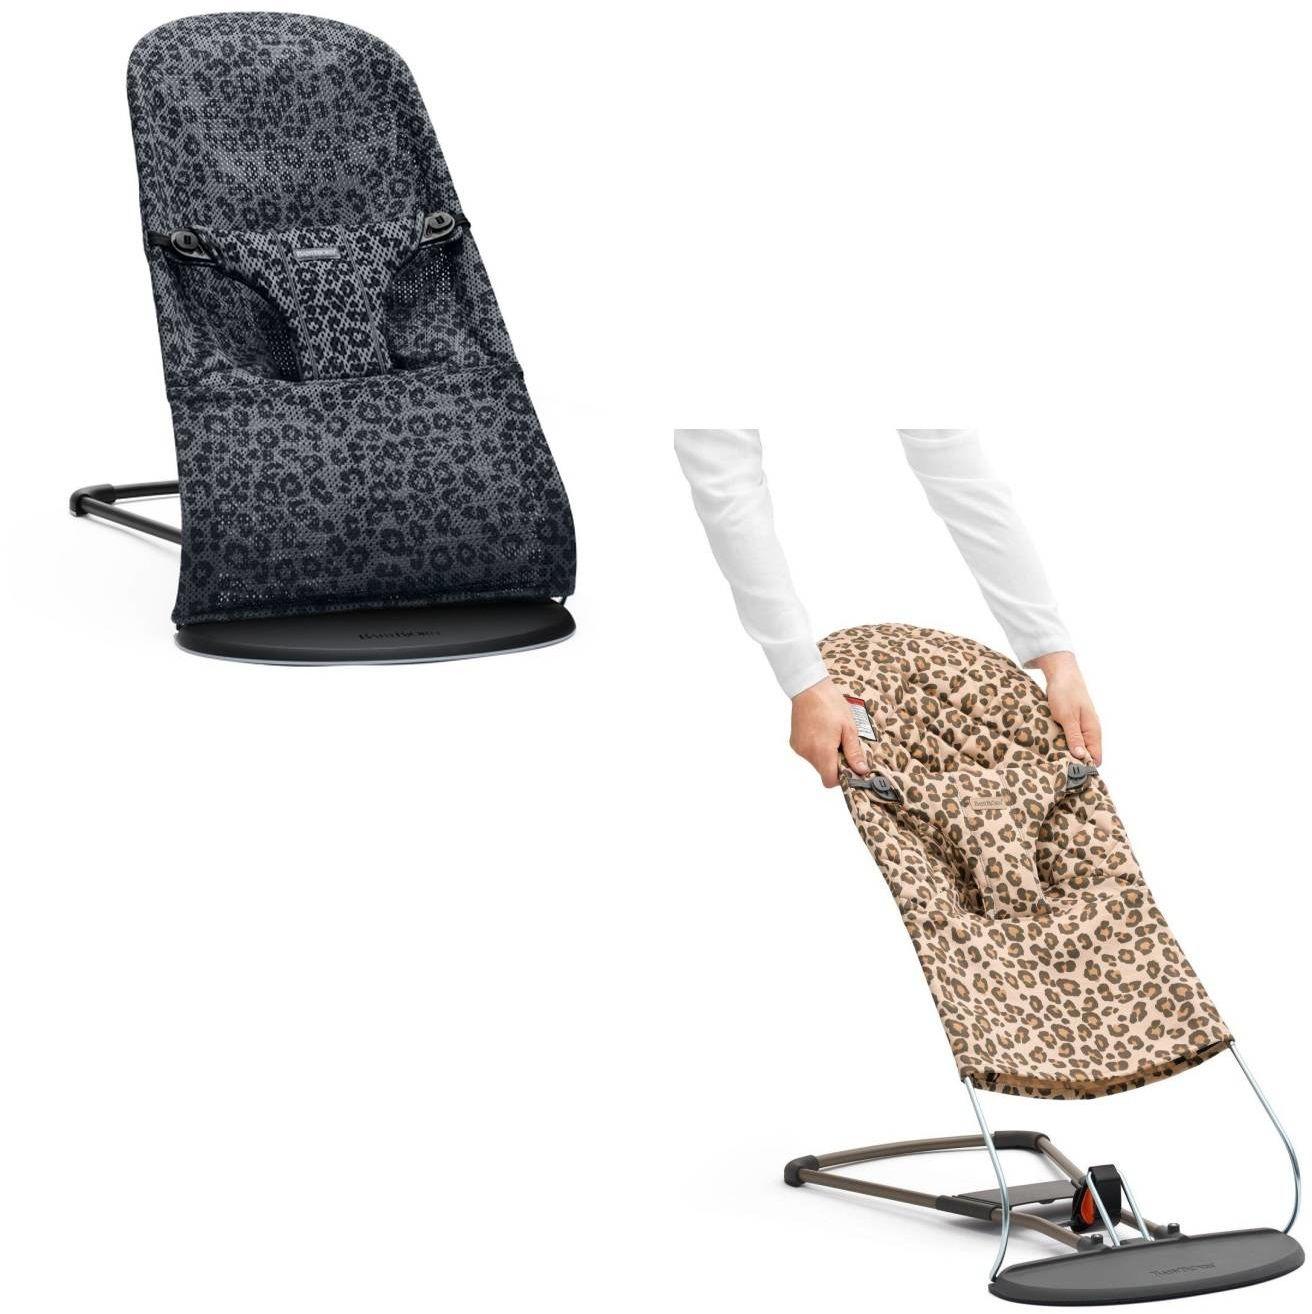 BABYBJORN - leżaczek BLISS MESH - Antracytowy/Leopard + poszycie do leżaczka Balance Bliss Beż/Leopard, Cotton